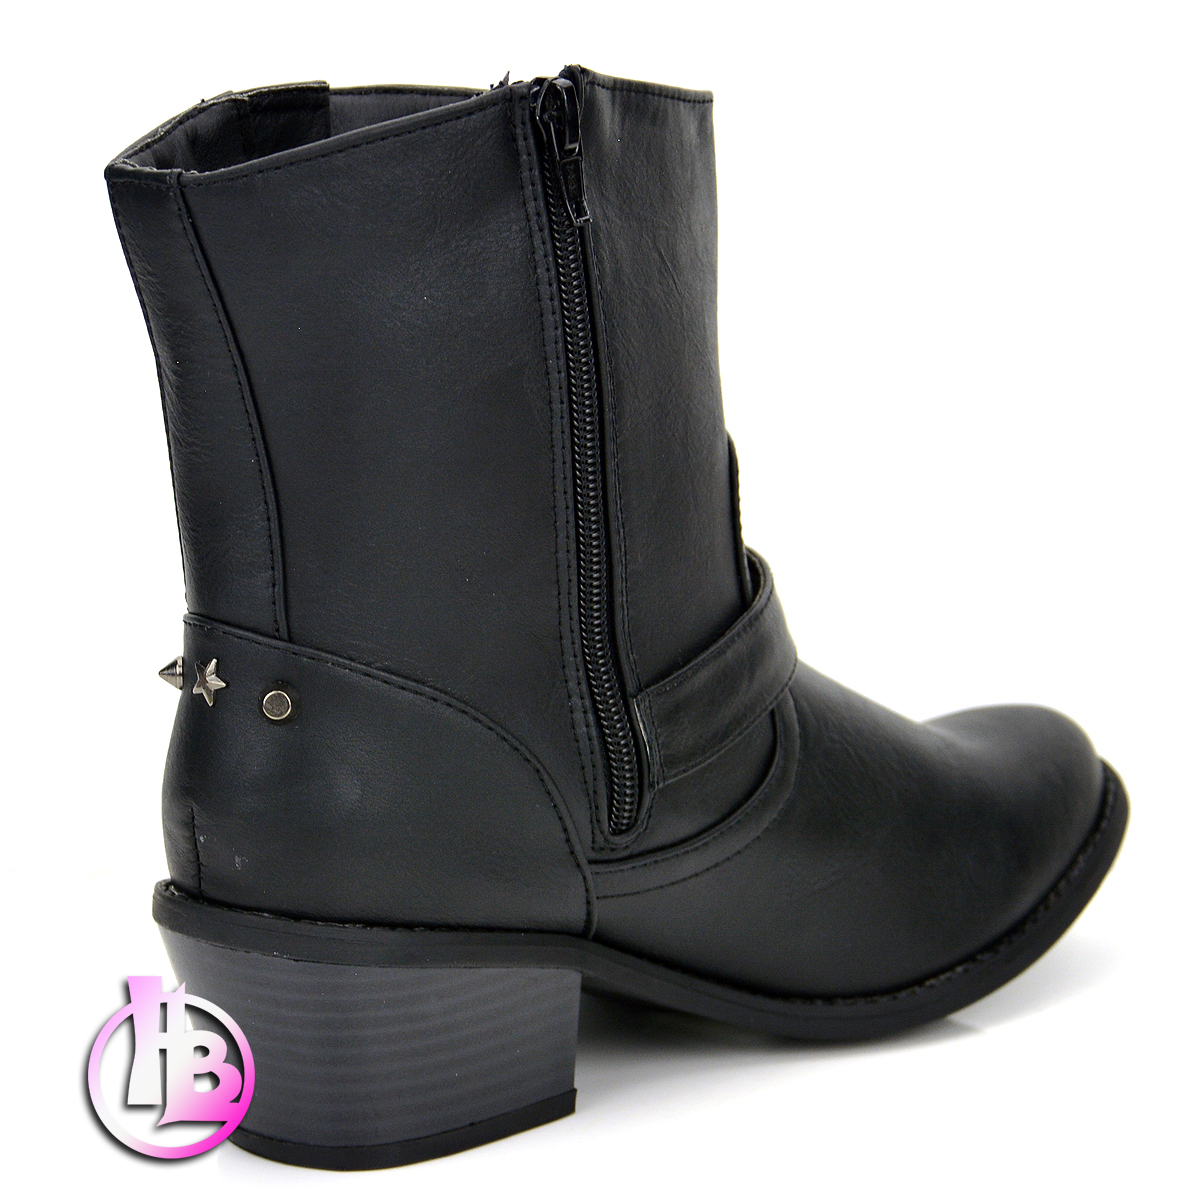 Girls Ankle Boots Designer Winter Shoe Size 10 11 12 2 3 4